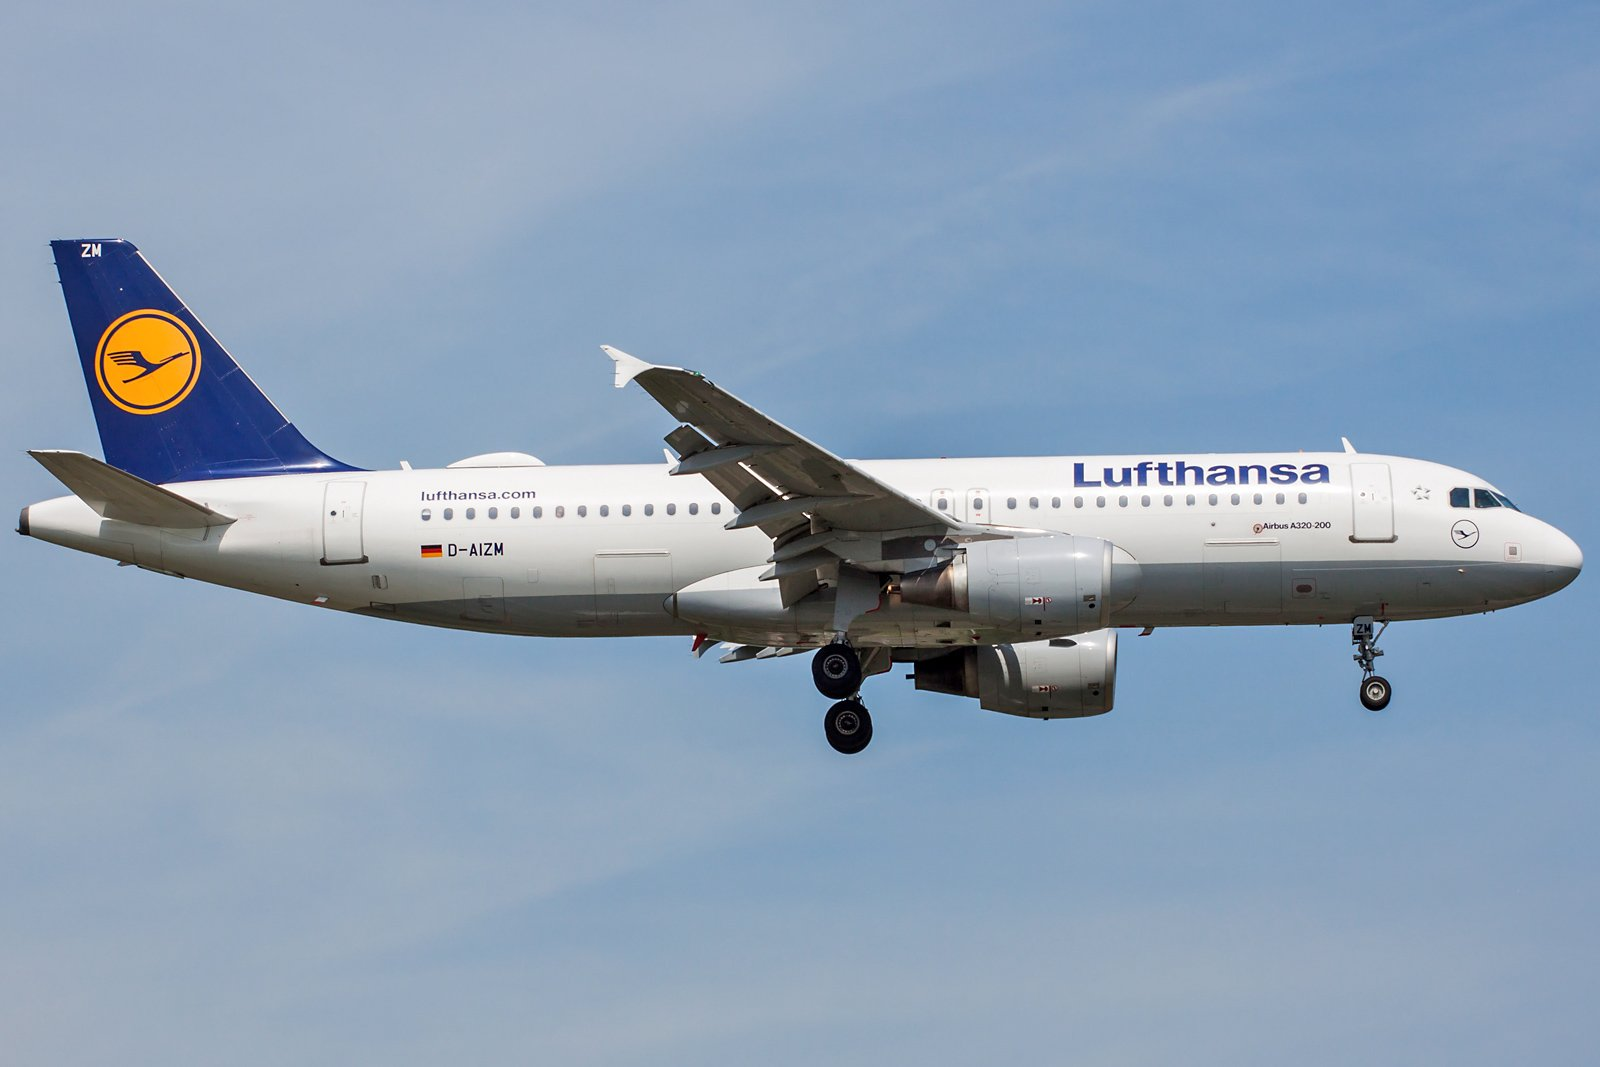 Lufthansa Airbus A320-214 D-AIZM